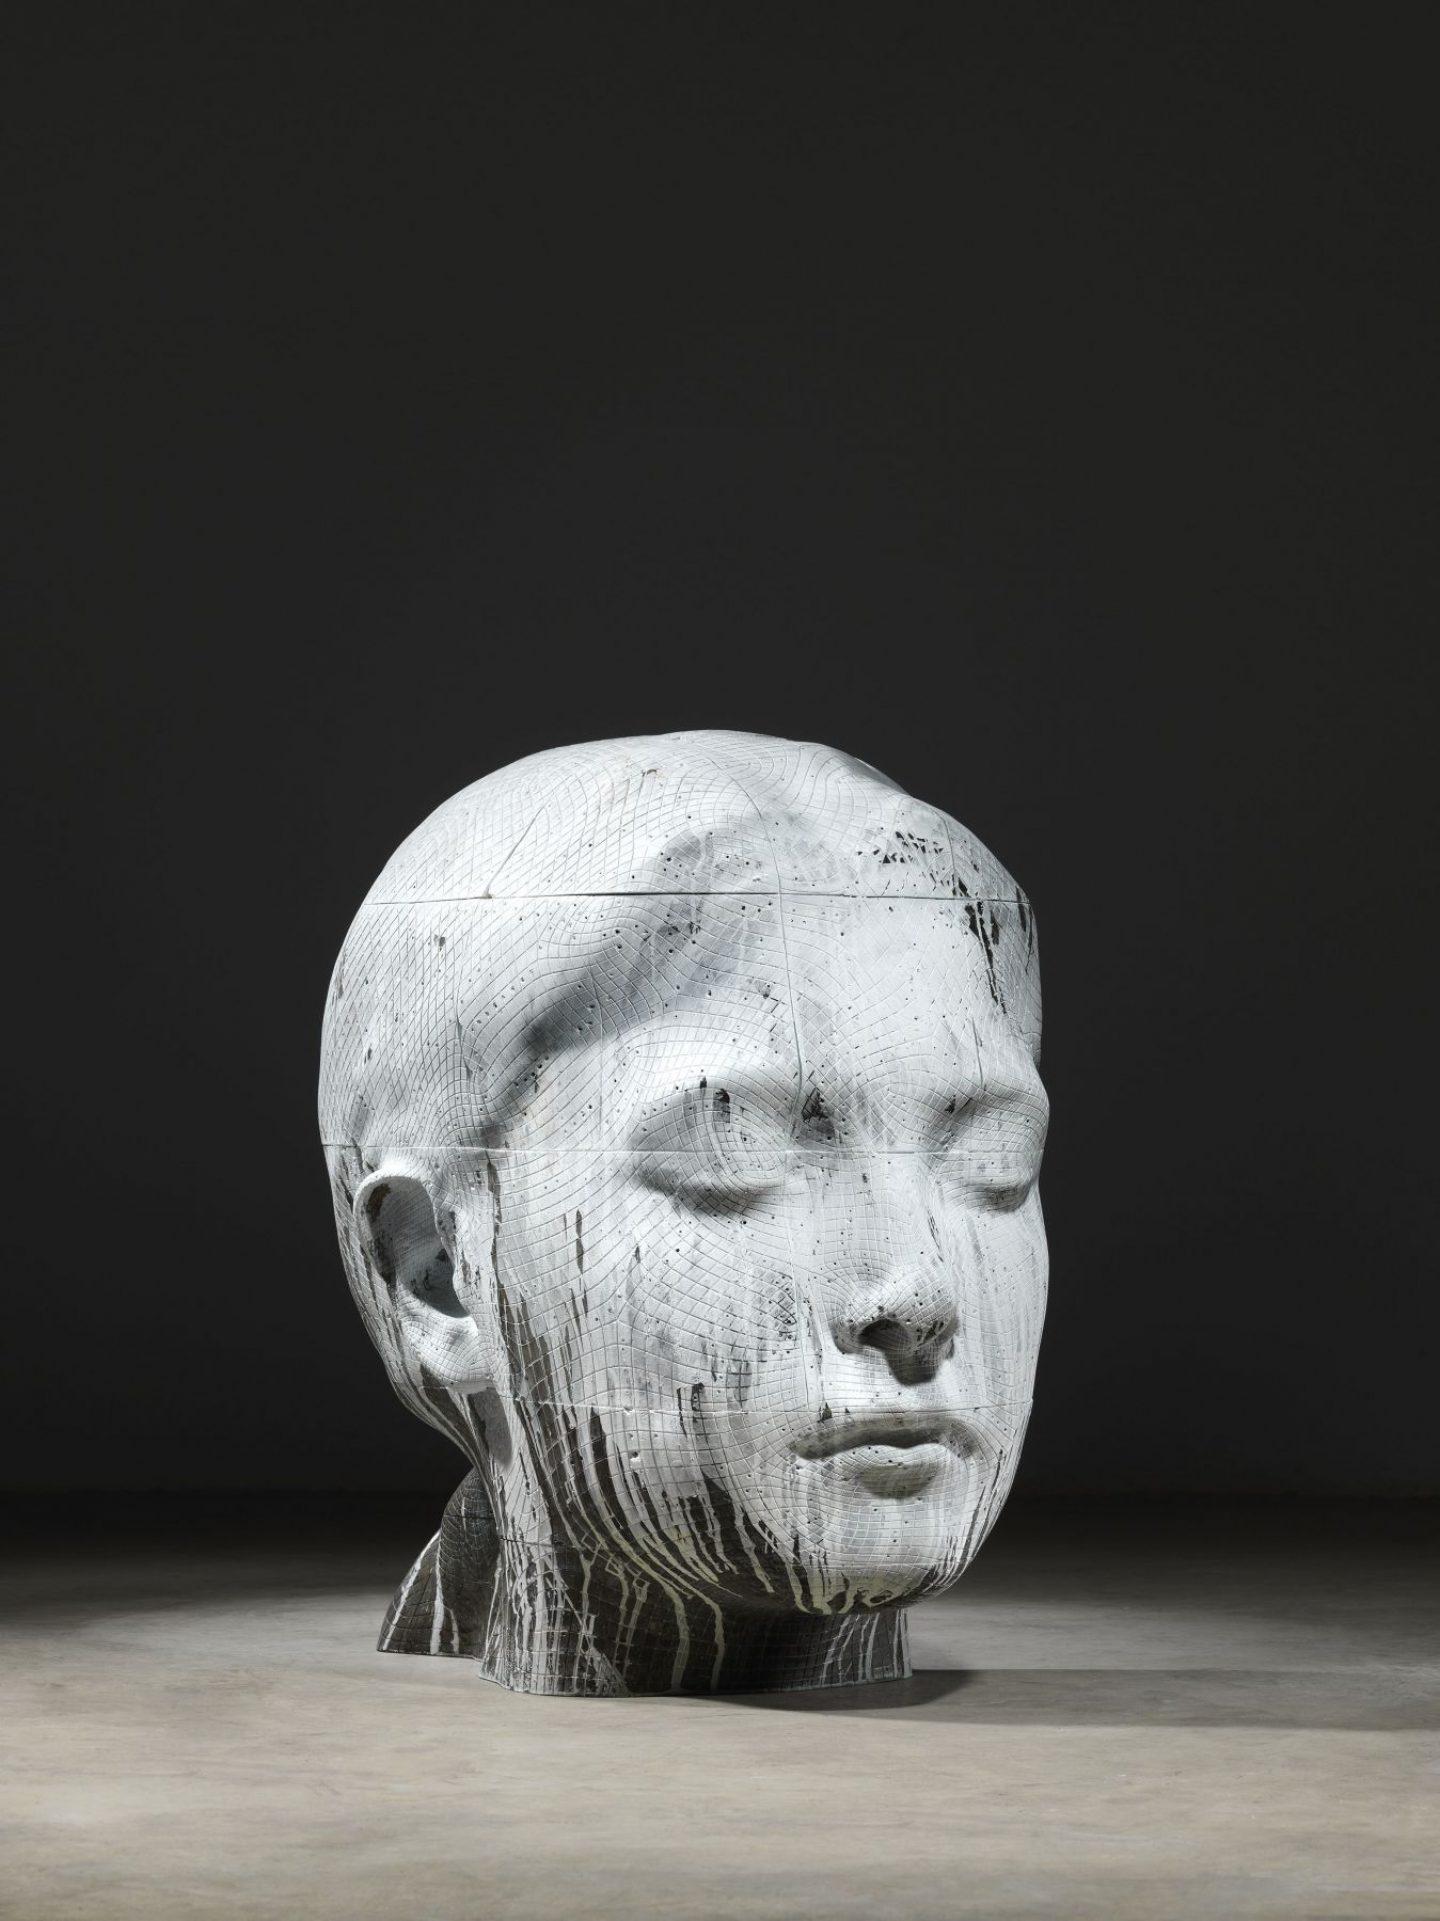 IGNANT-Art-Jaume-Plensa-Nocturne-05